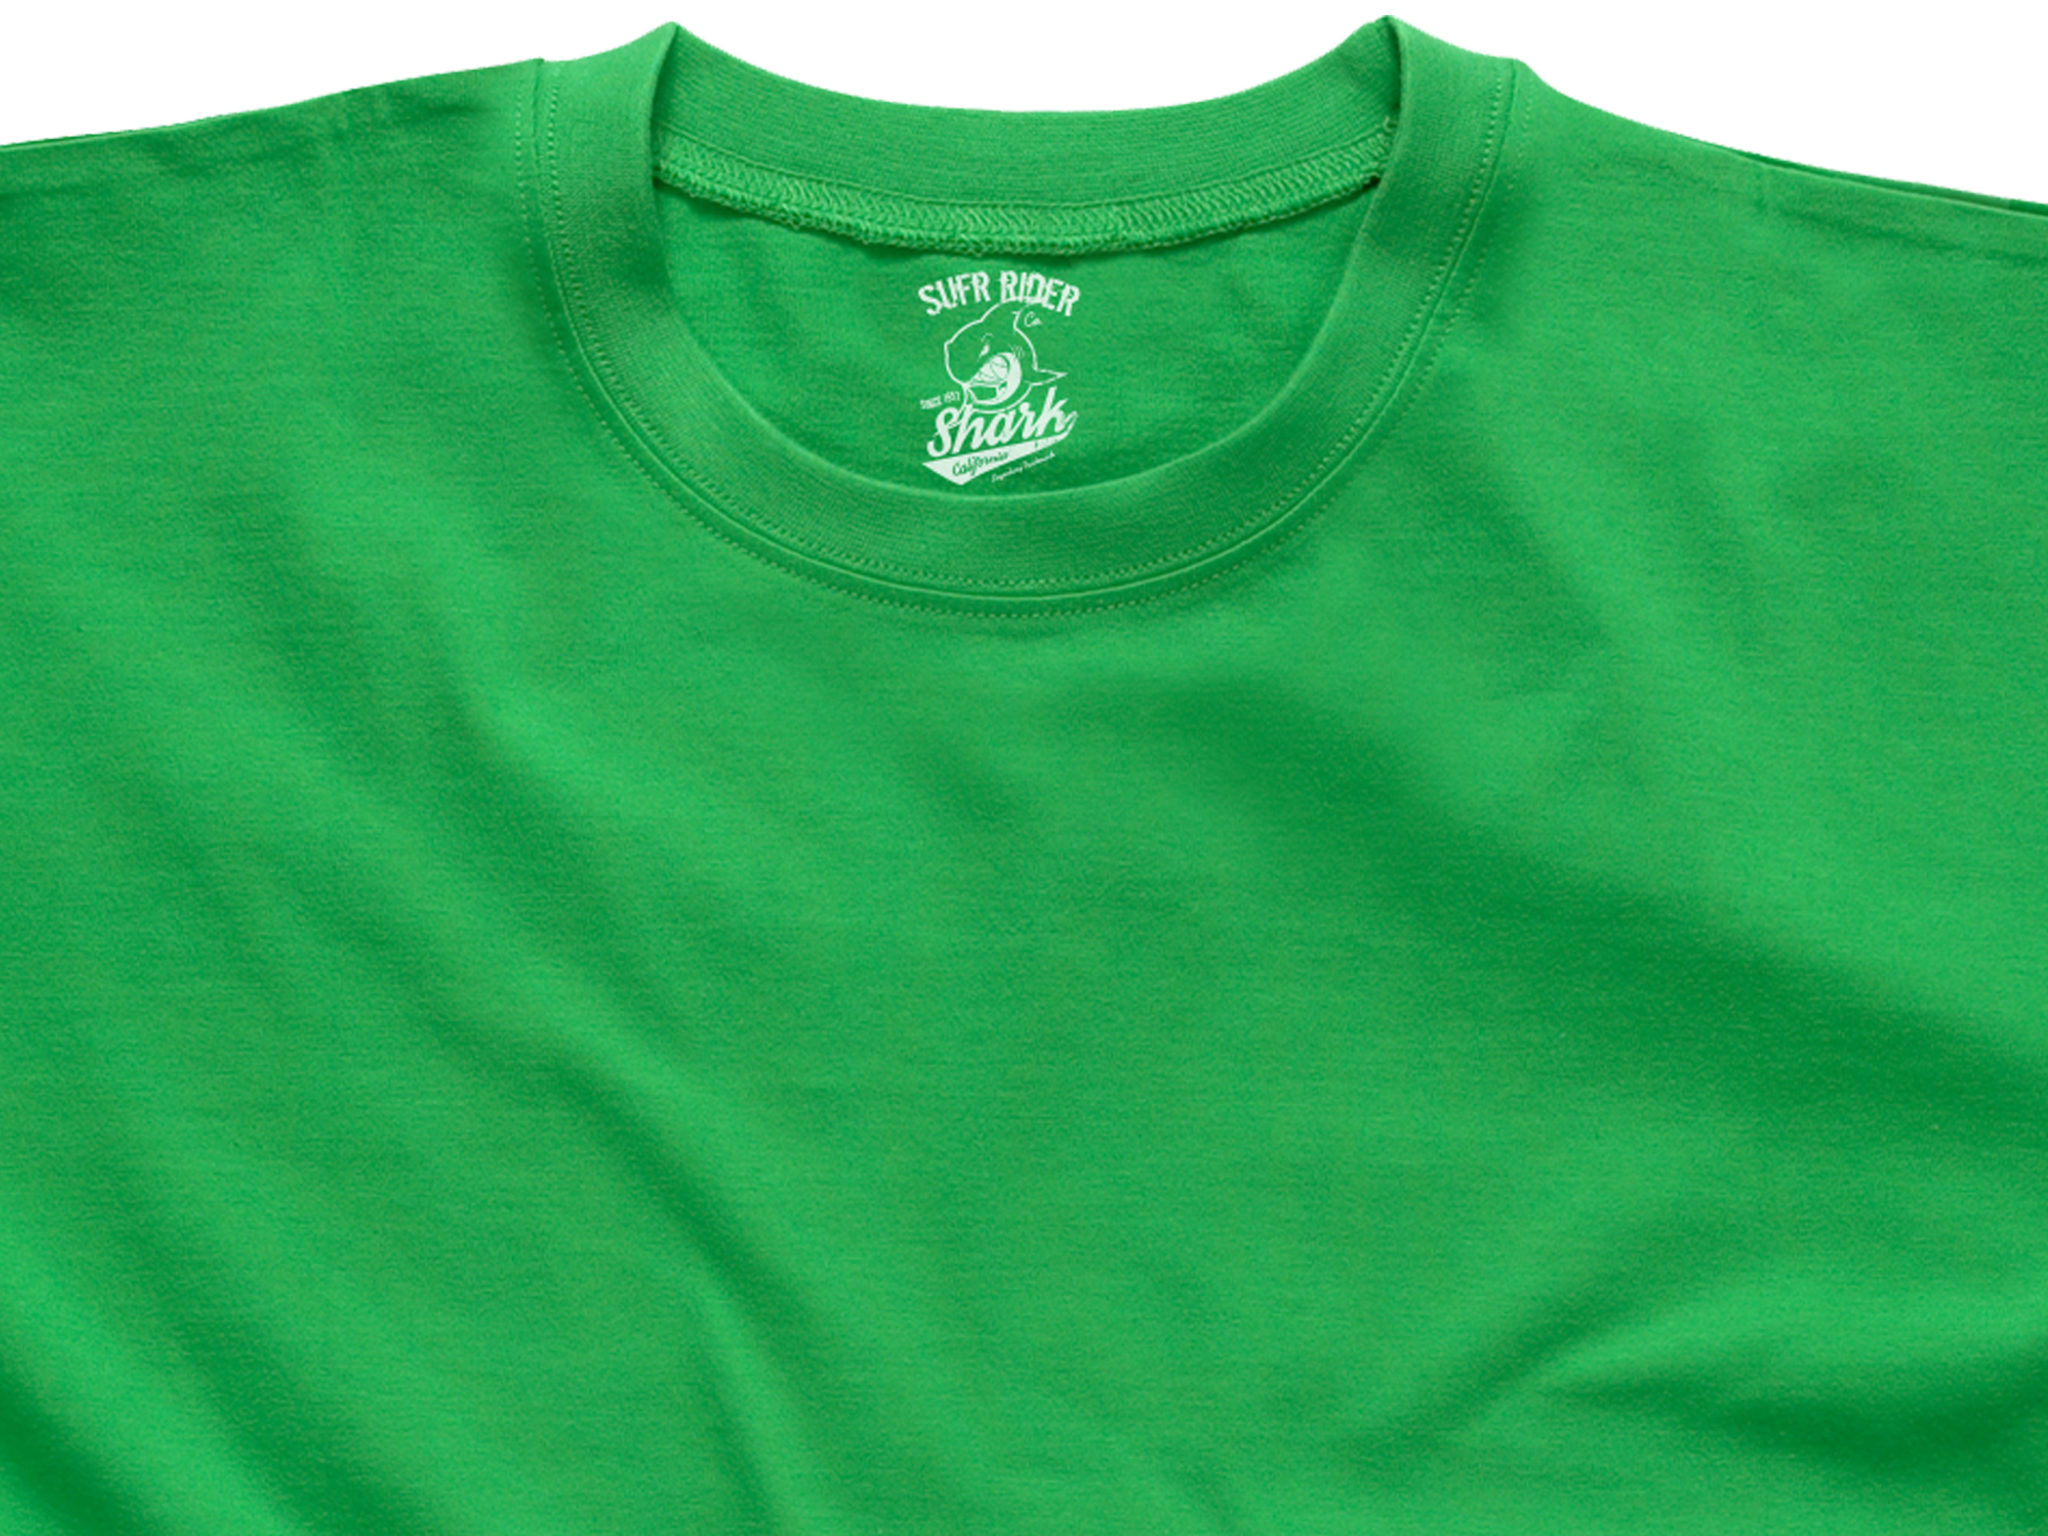 Custom Heat Transfers For T Shirts Wholesale - Nils Stucki